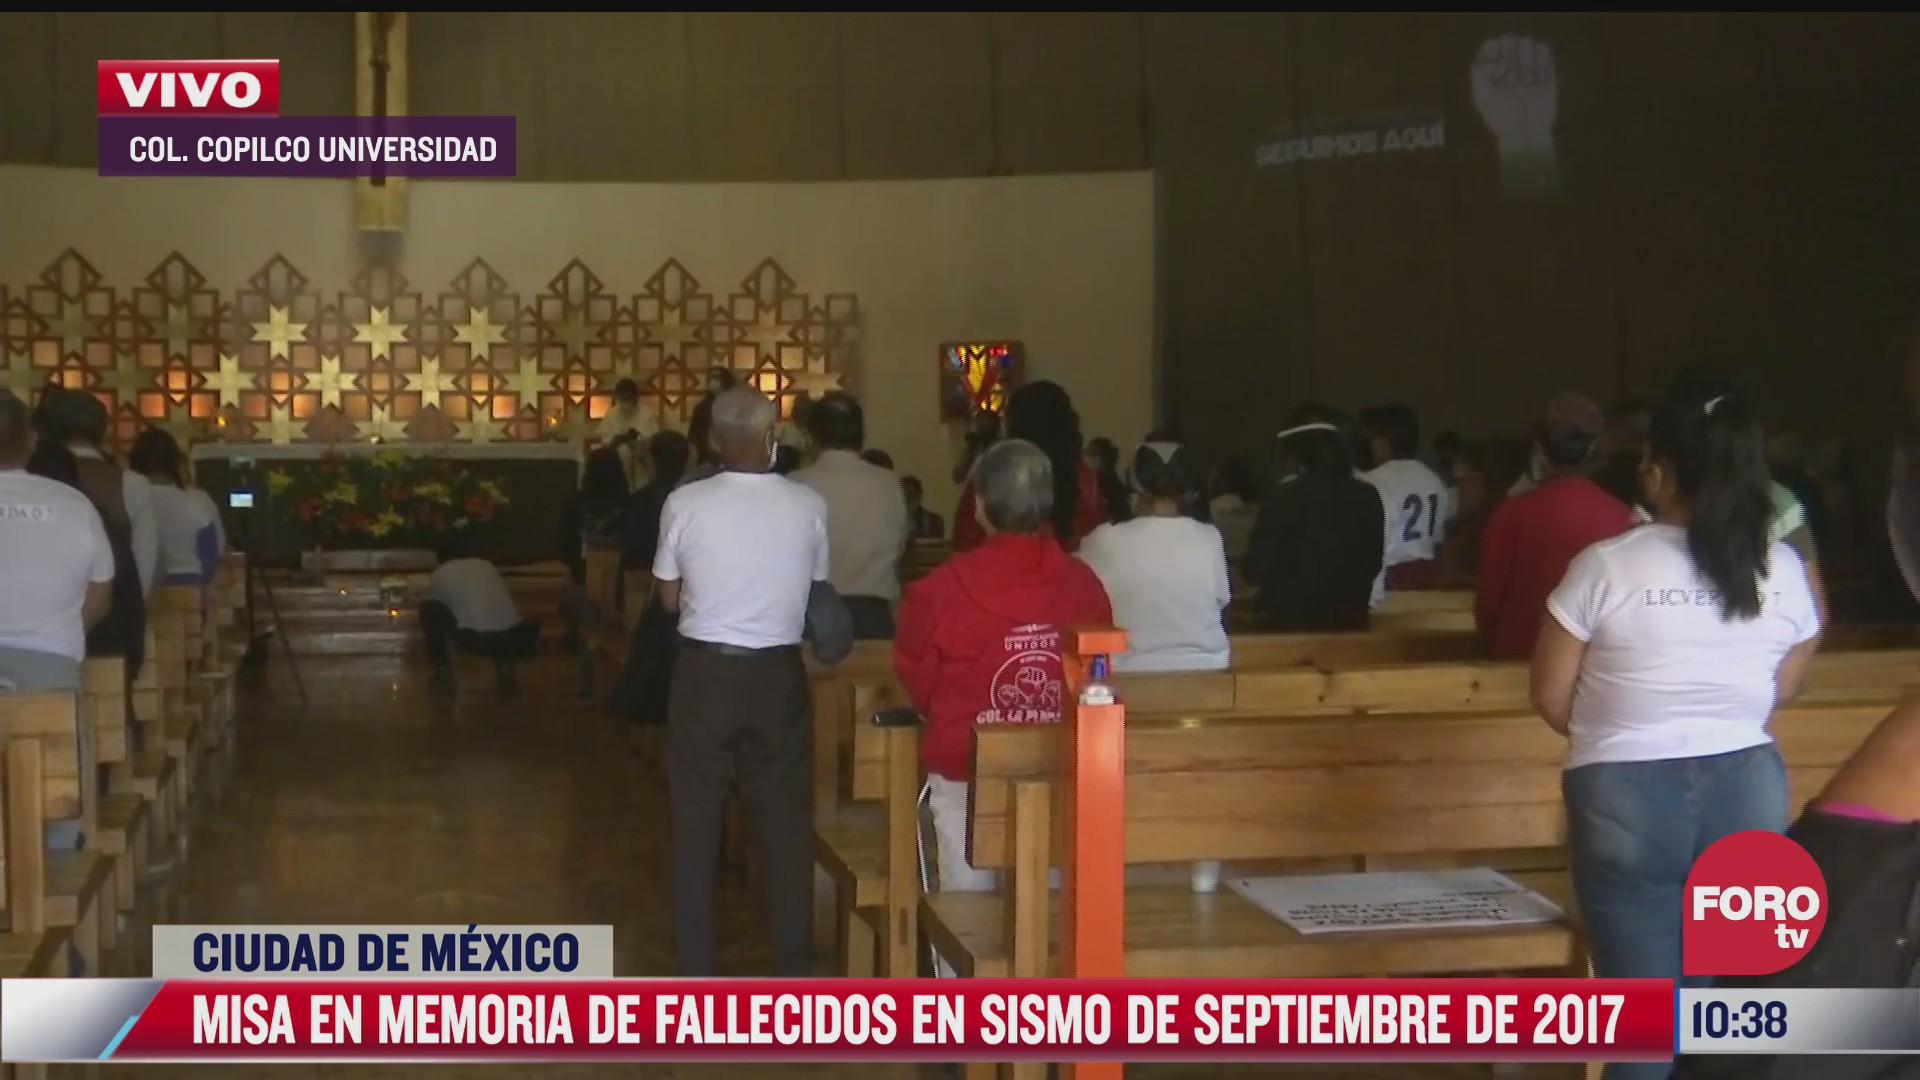 realizan misa en memoria de fallecidos en sismo de septiembre de